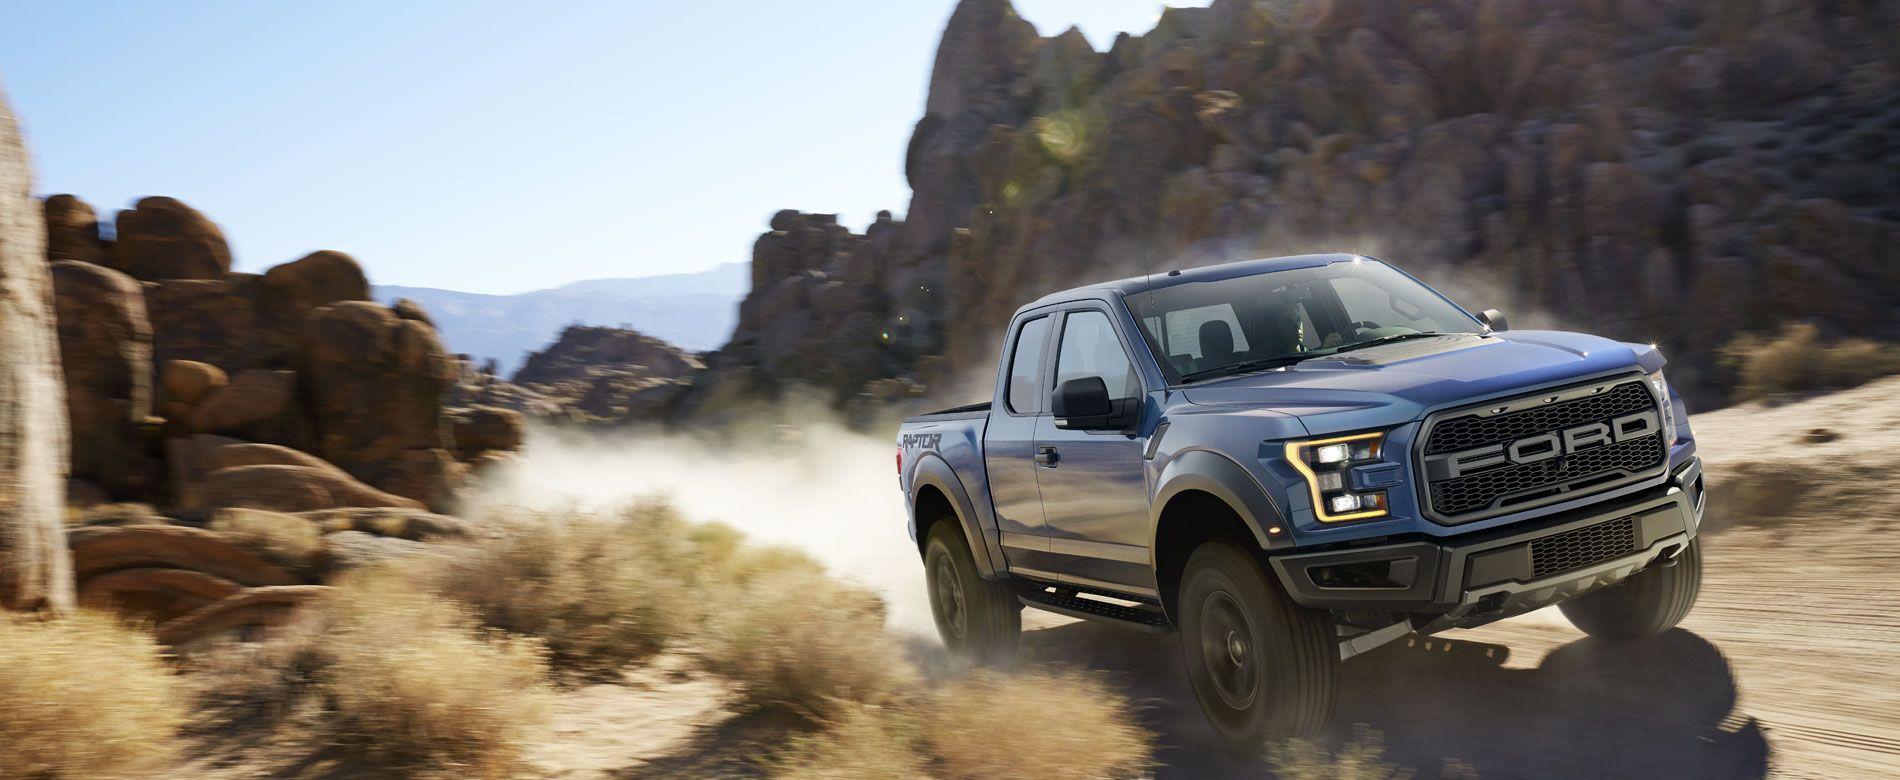 25 best f150 raptor price ideas on pinterest 2014 ford raptor 2016 ford raptor and ford raptor lifted